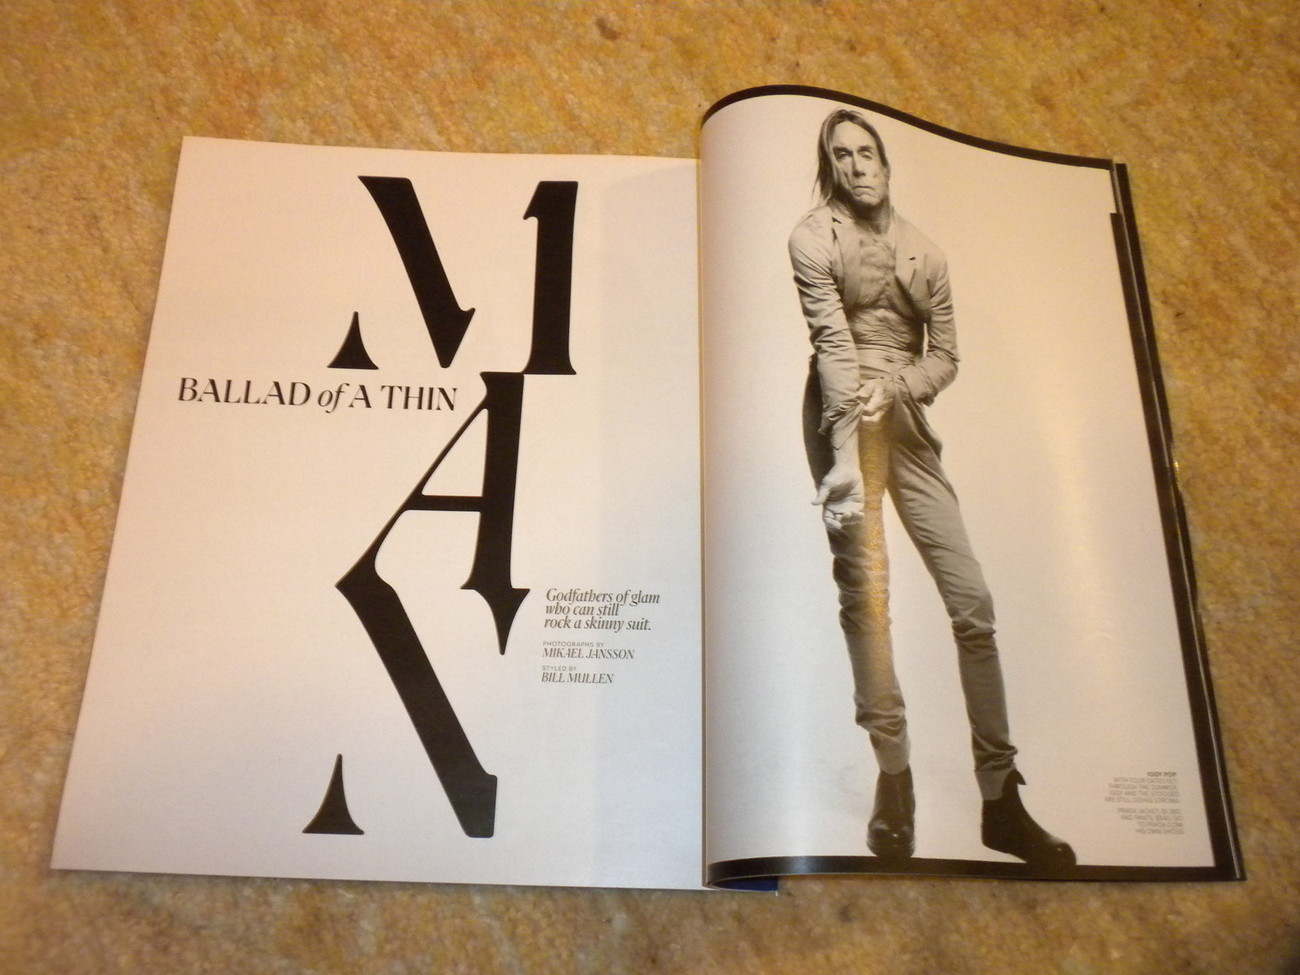 Tim Lincecum, Rock Star photos, Spring Fashion New York Times Style Mag 2011 nf